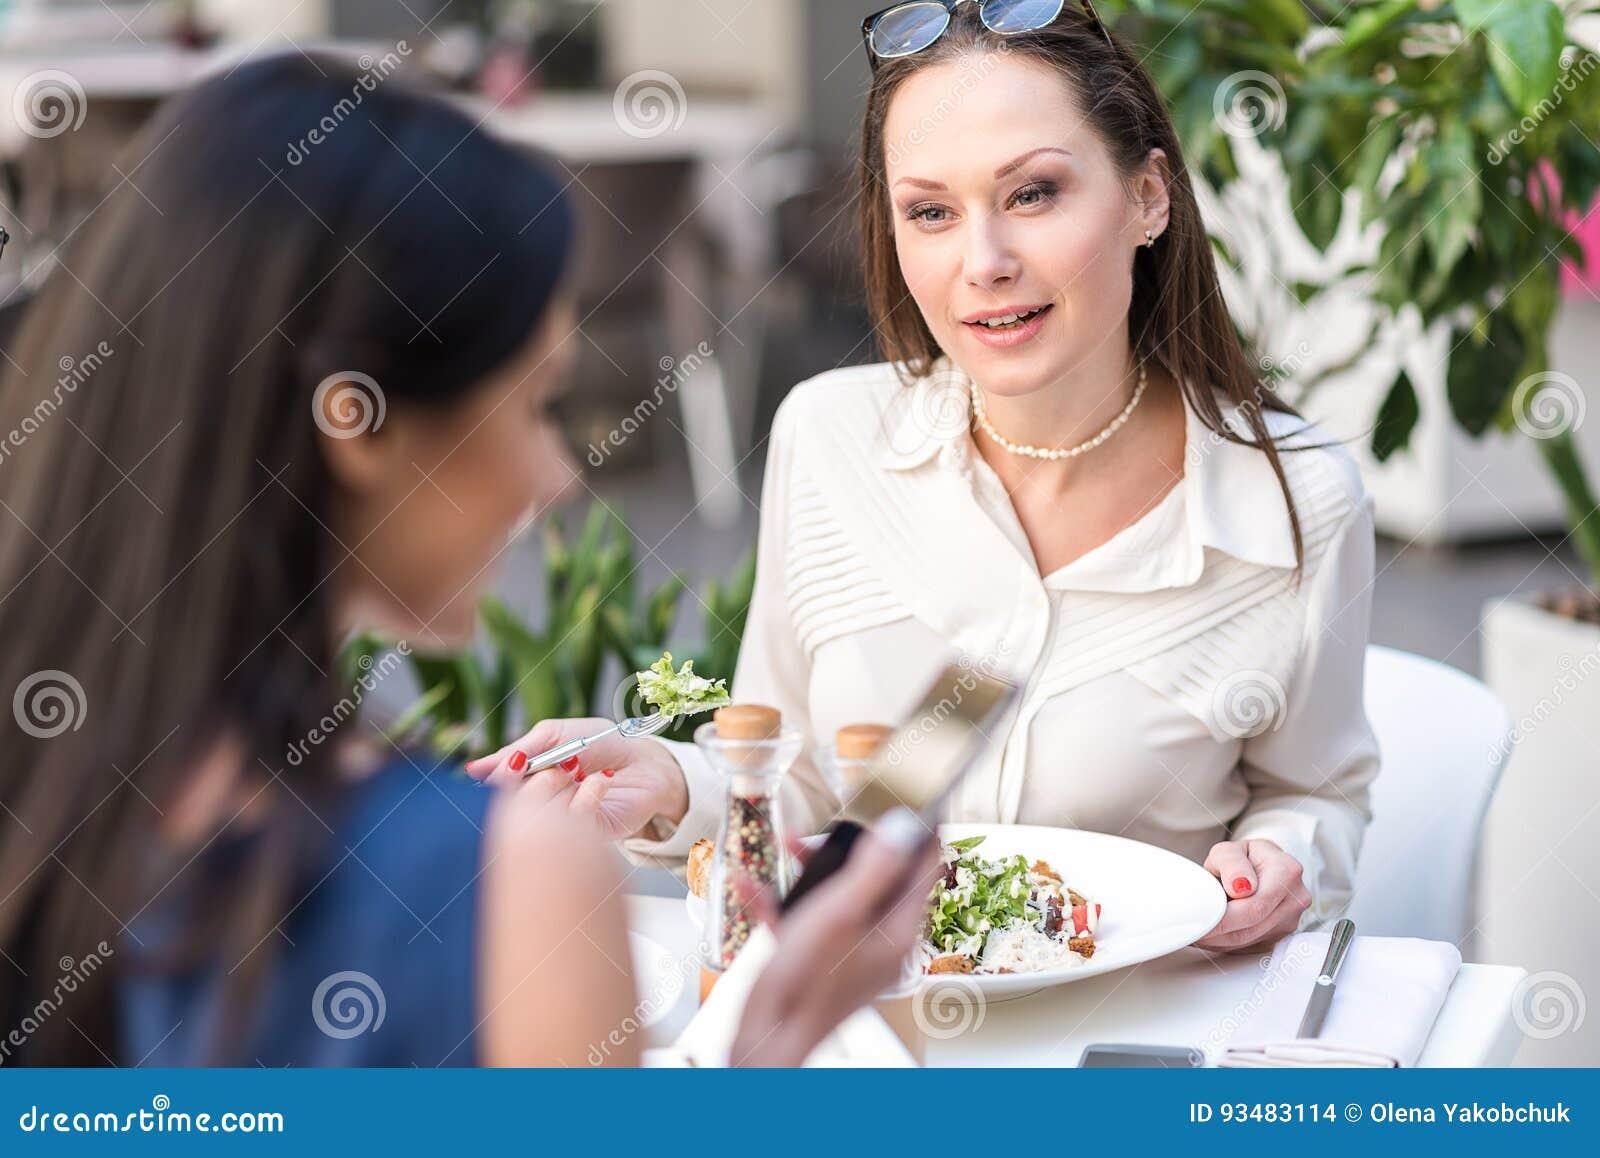 Geinteresseerde vrouwen proevende salade in koffie